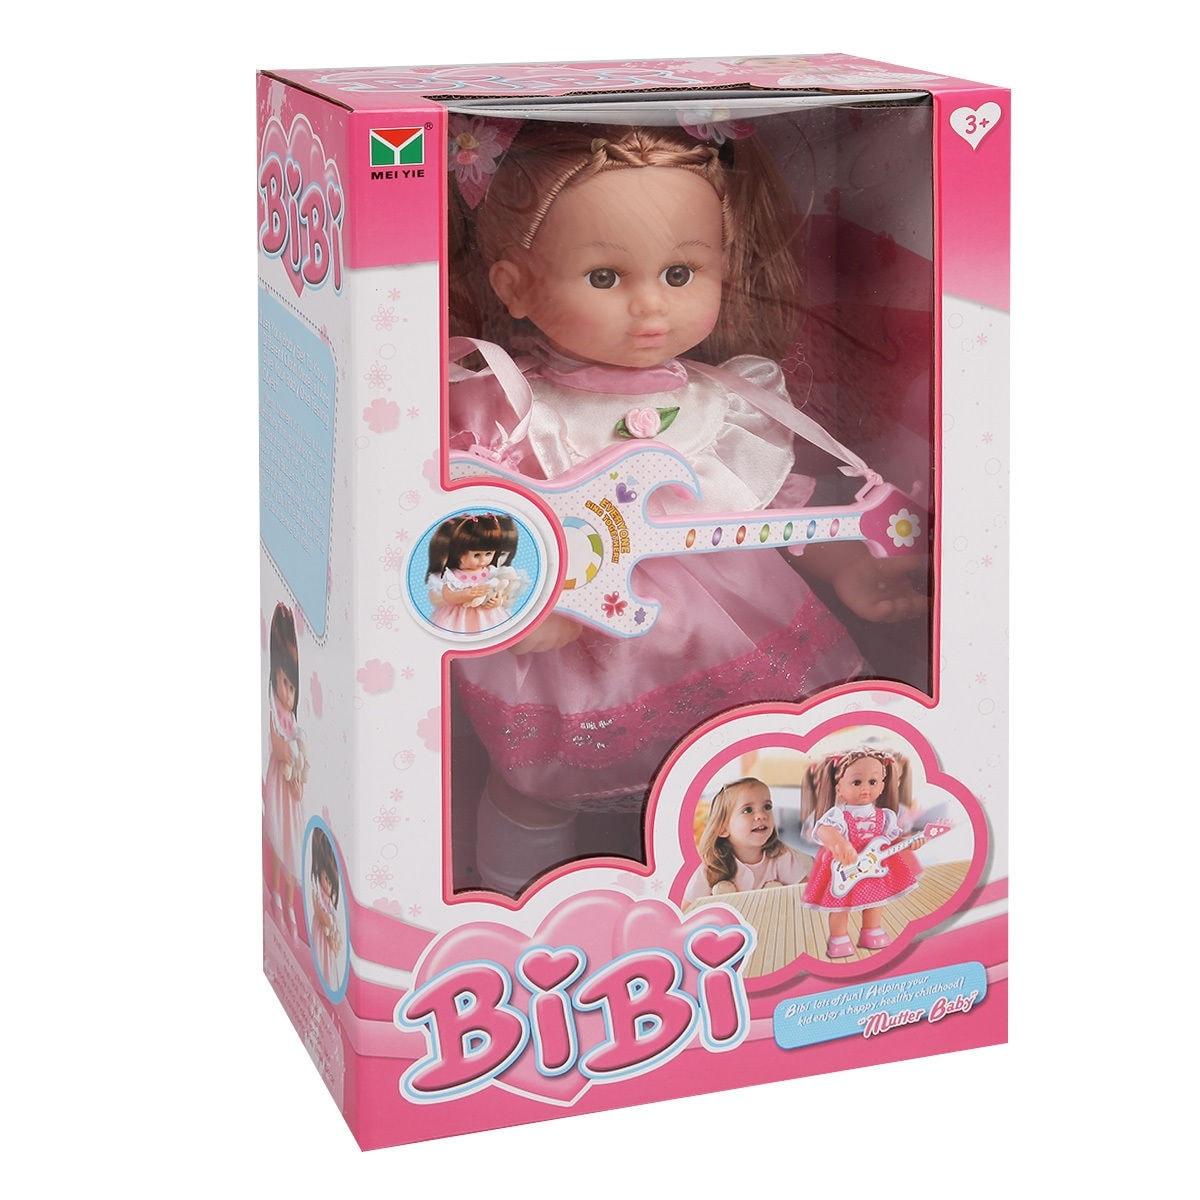 Costway 16'' Girl Doll Pretend Play Guitar Lifelike Singing 3 Songs Voice  Control - Pink